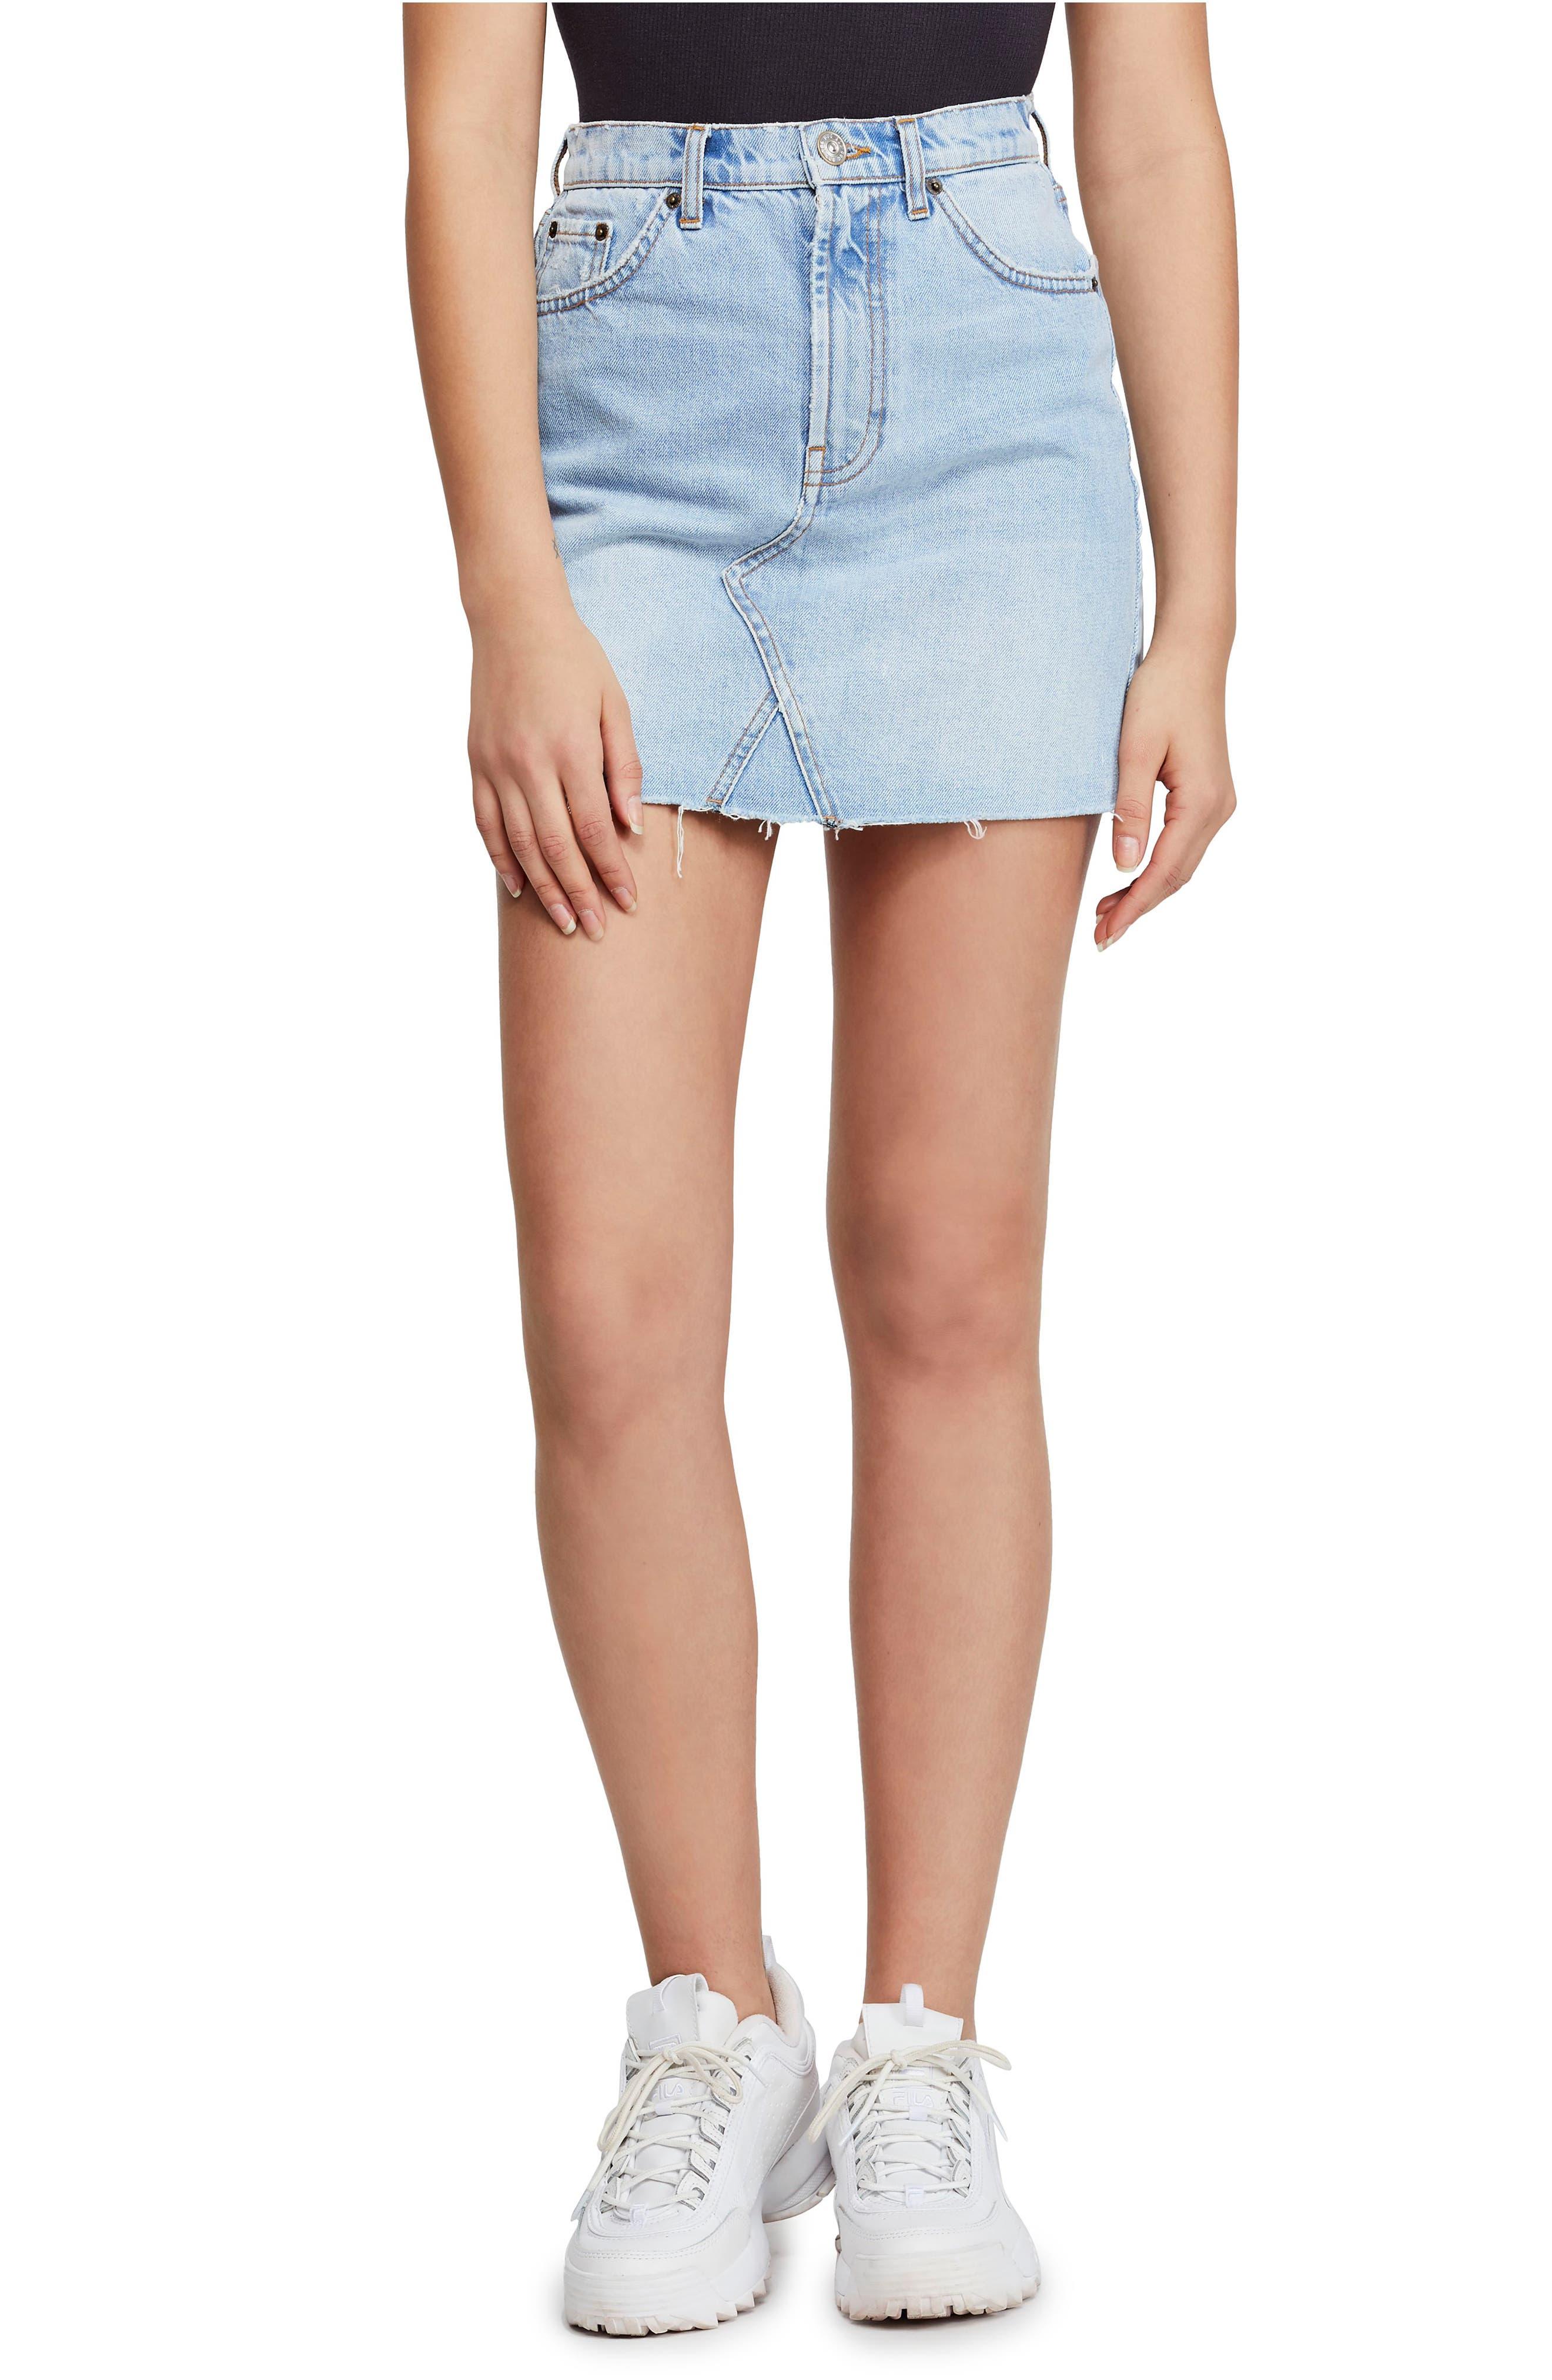 Bdg Urban Outfitters Austin Cutoff Denim Miniskirt, Blue